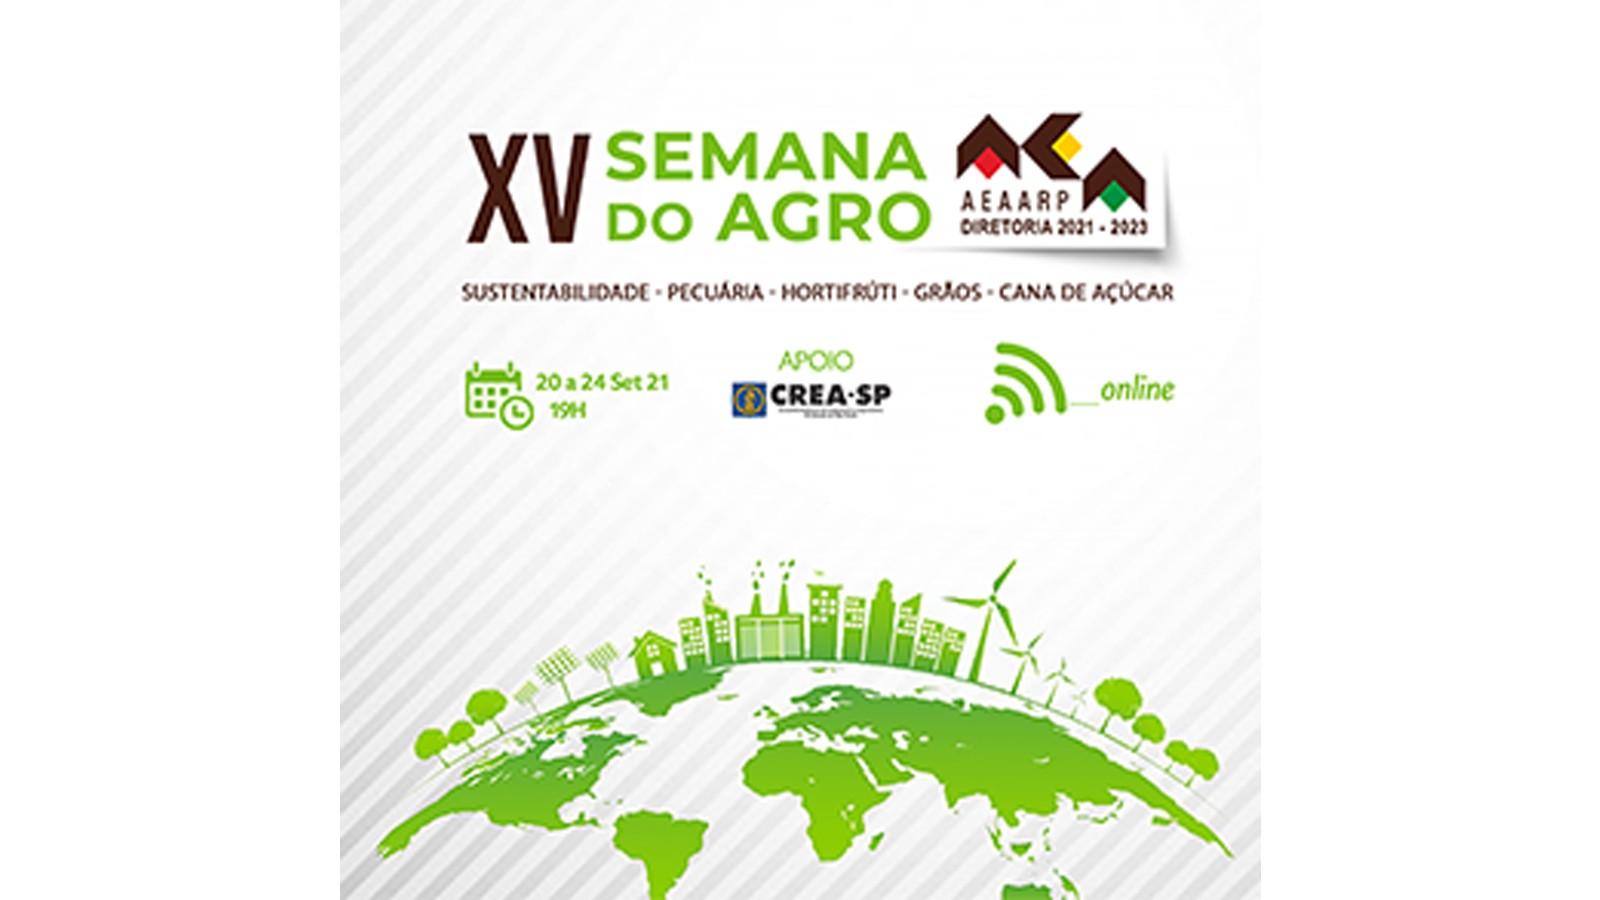 AEAARP realiza 15ª Semana do Agro